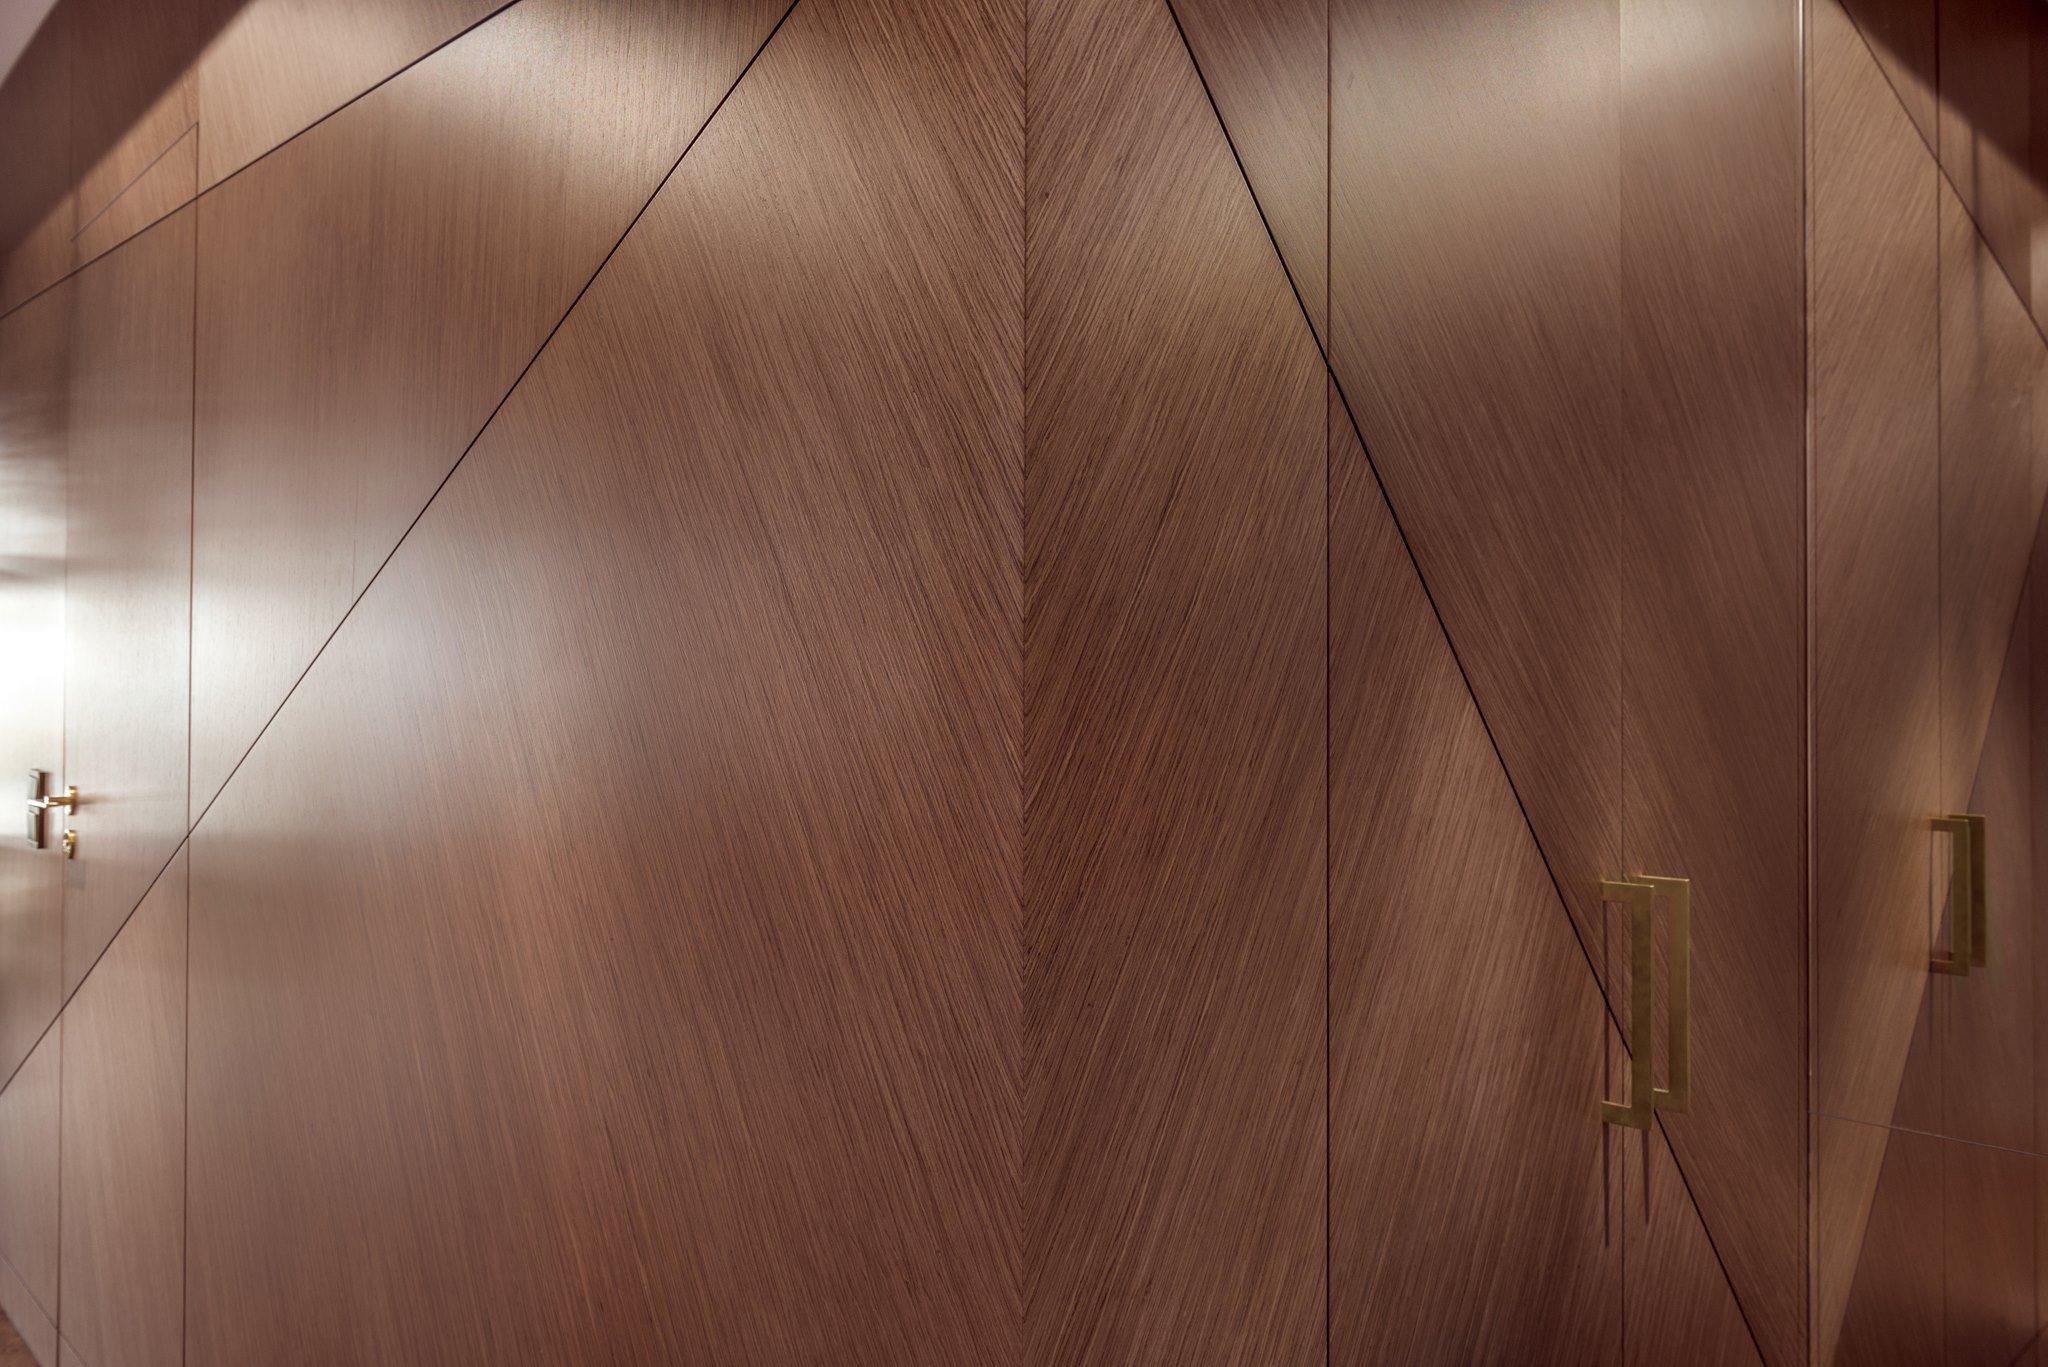 Byt plný dřeva